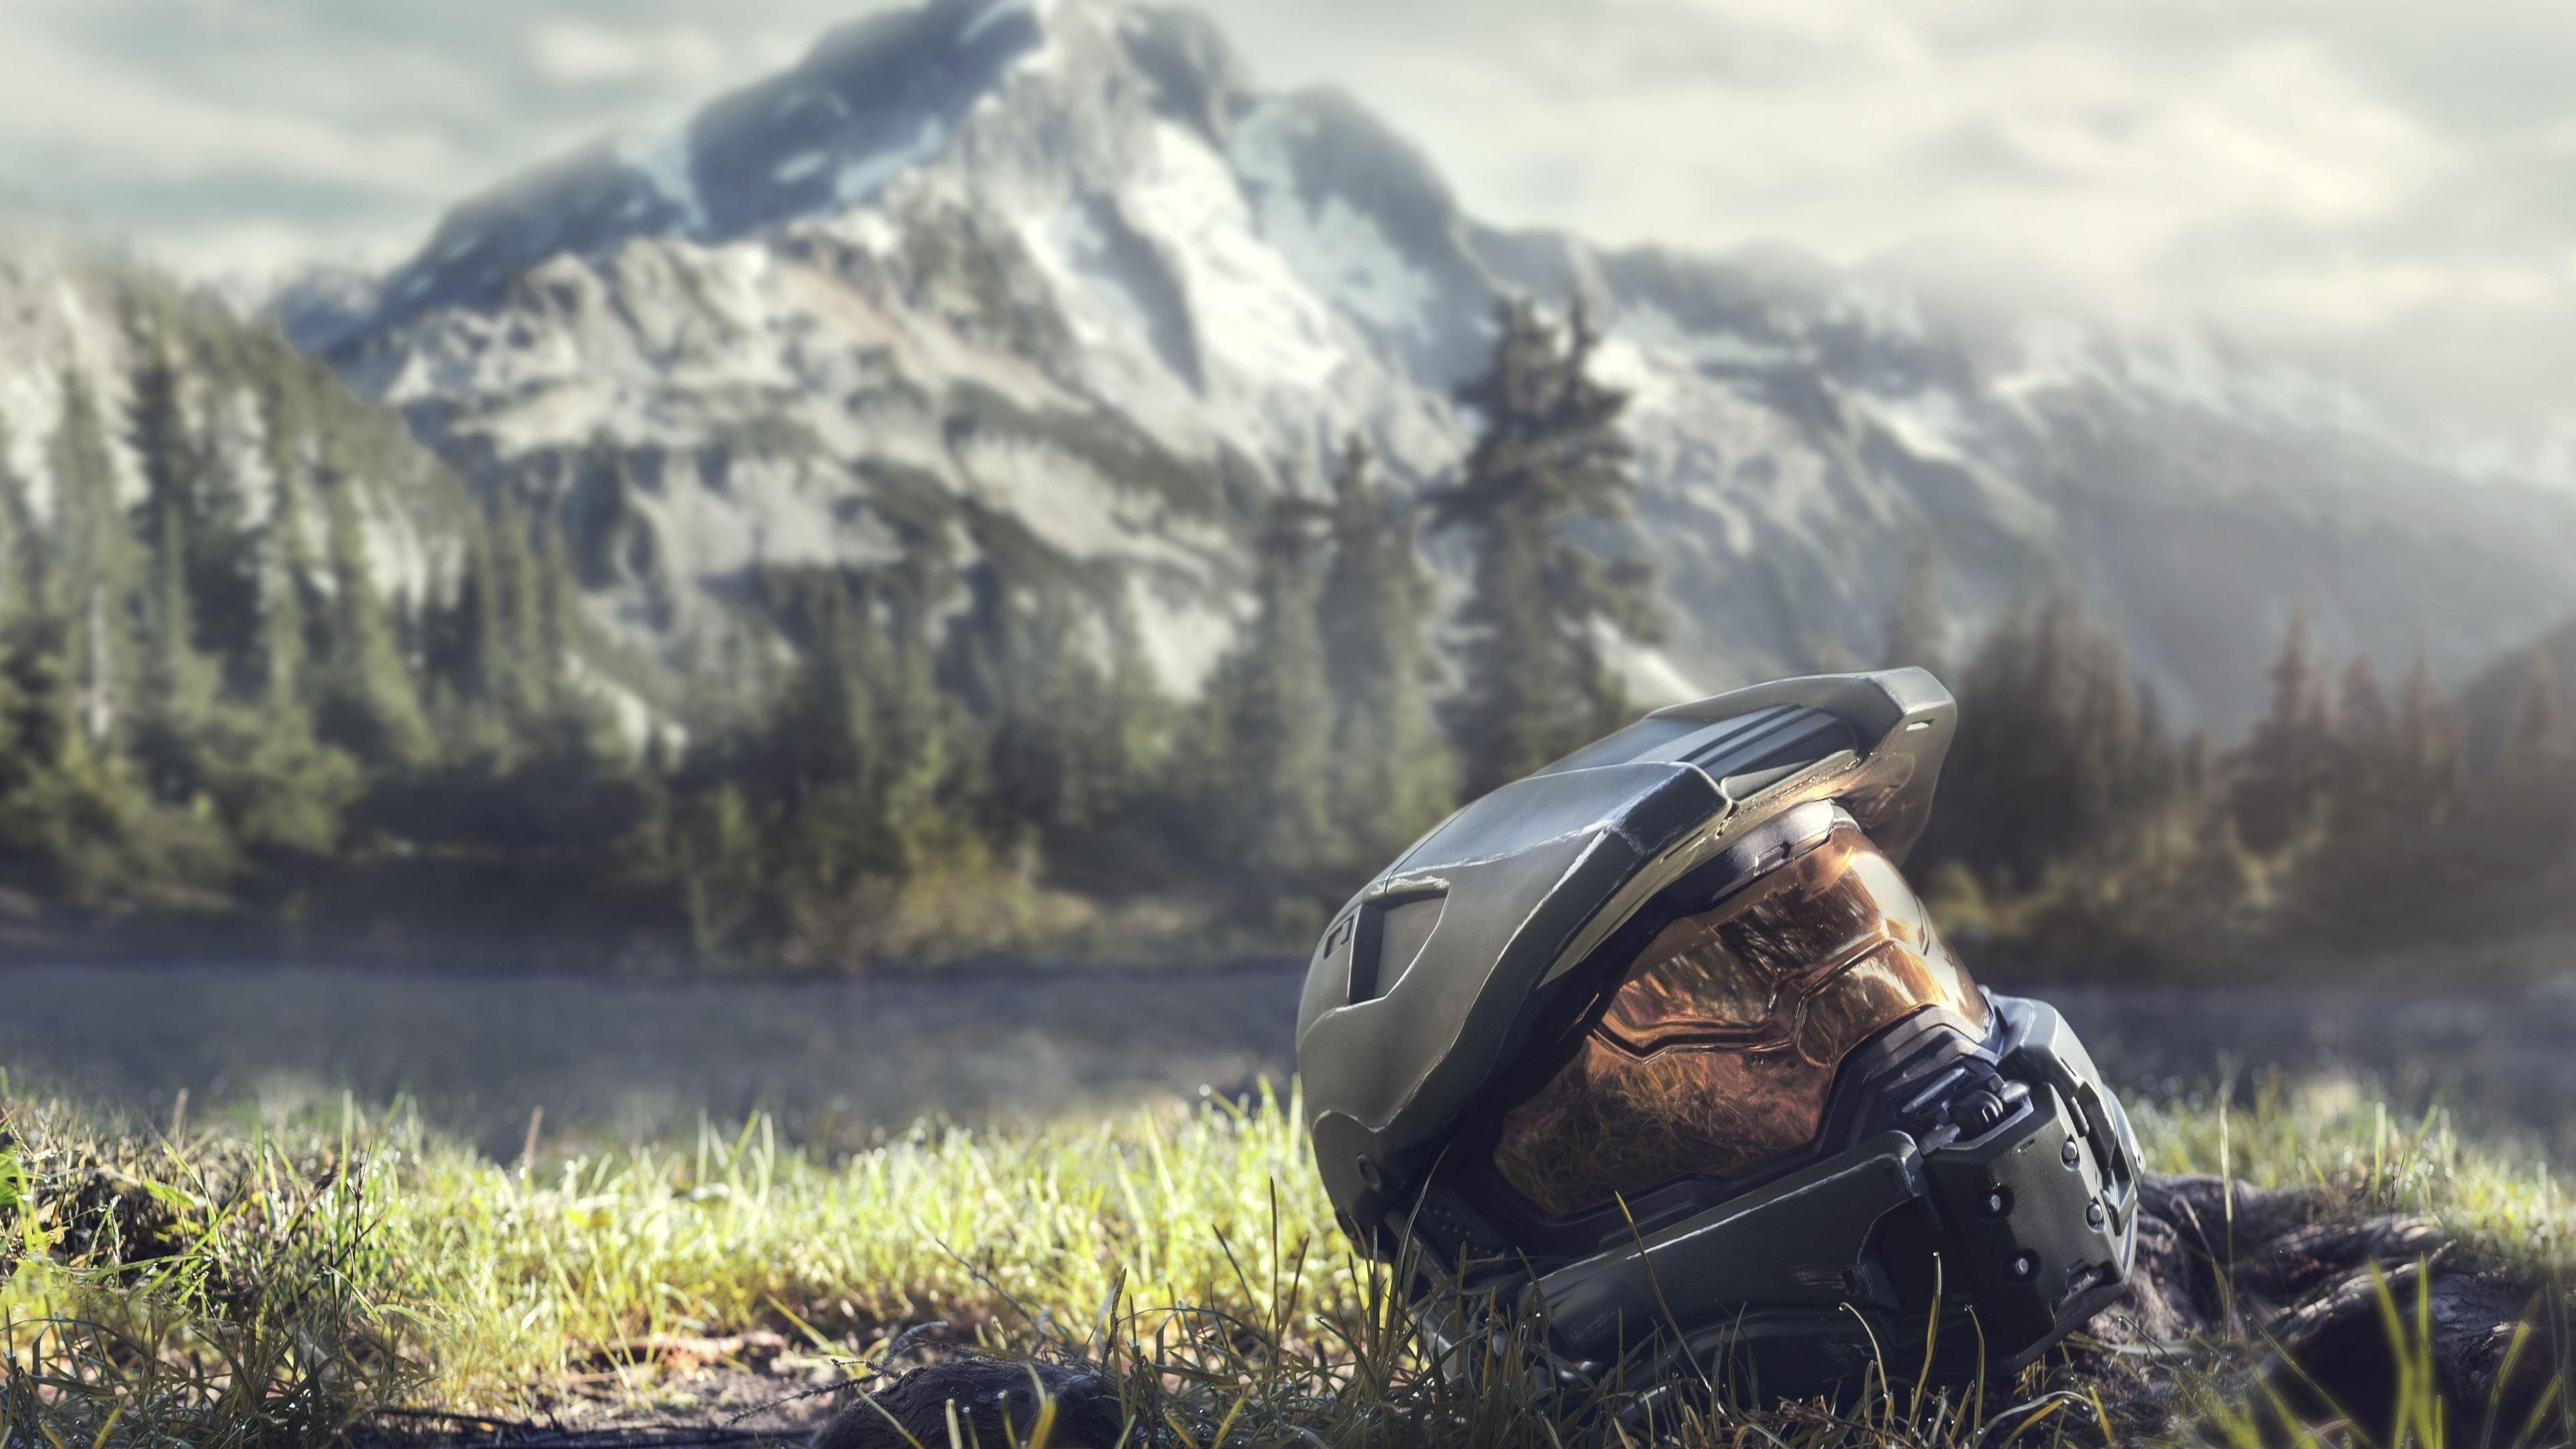 Halo Infinite 4K Wallpapers - Top Free Halo Infinite 4K ...